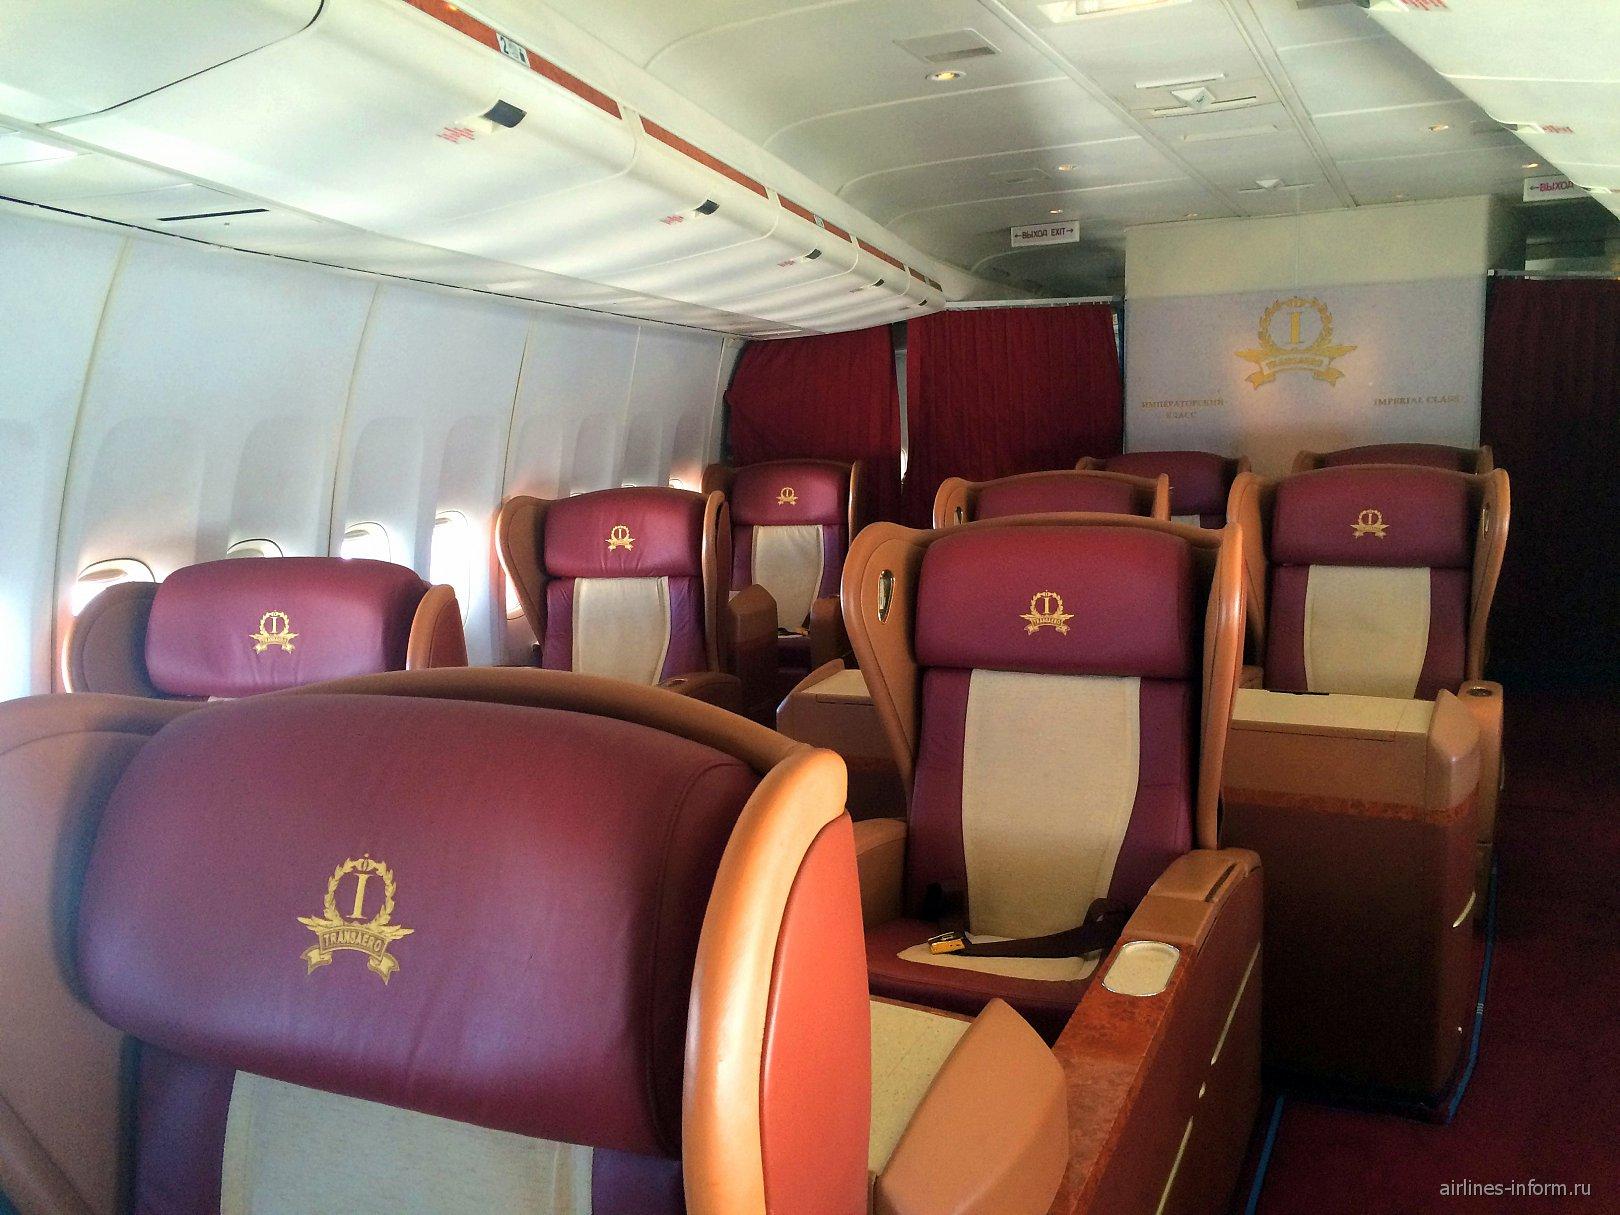 "Империал-класс авиакомпании ""Трансаэро"" в самолете Боинг-747-400"